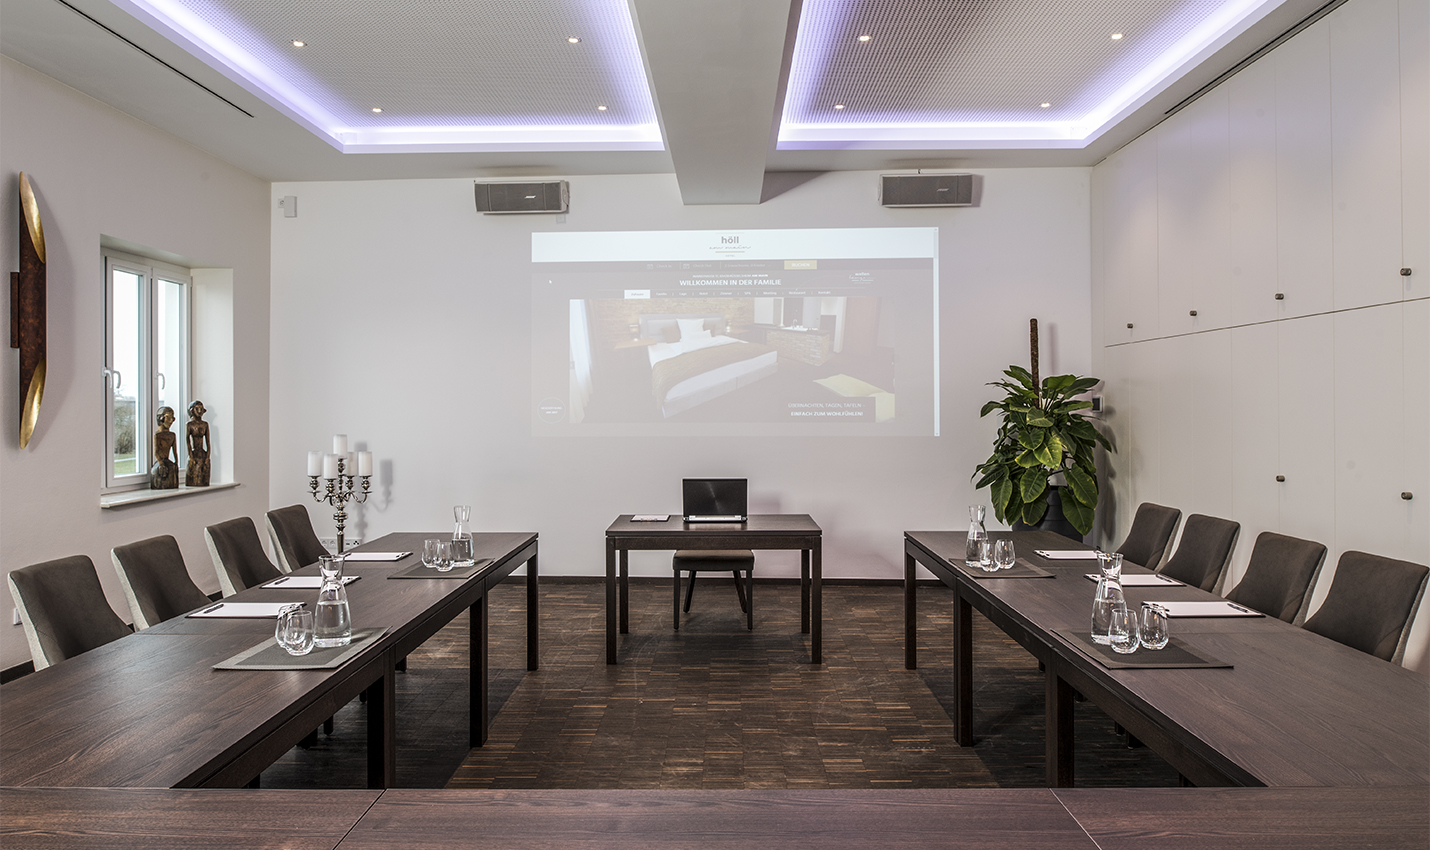 Gesellschafts- / Konferenzraum (Saal)